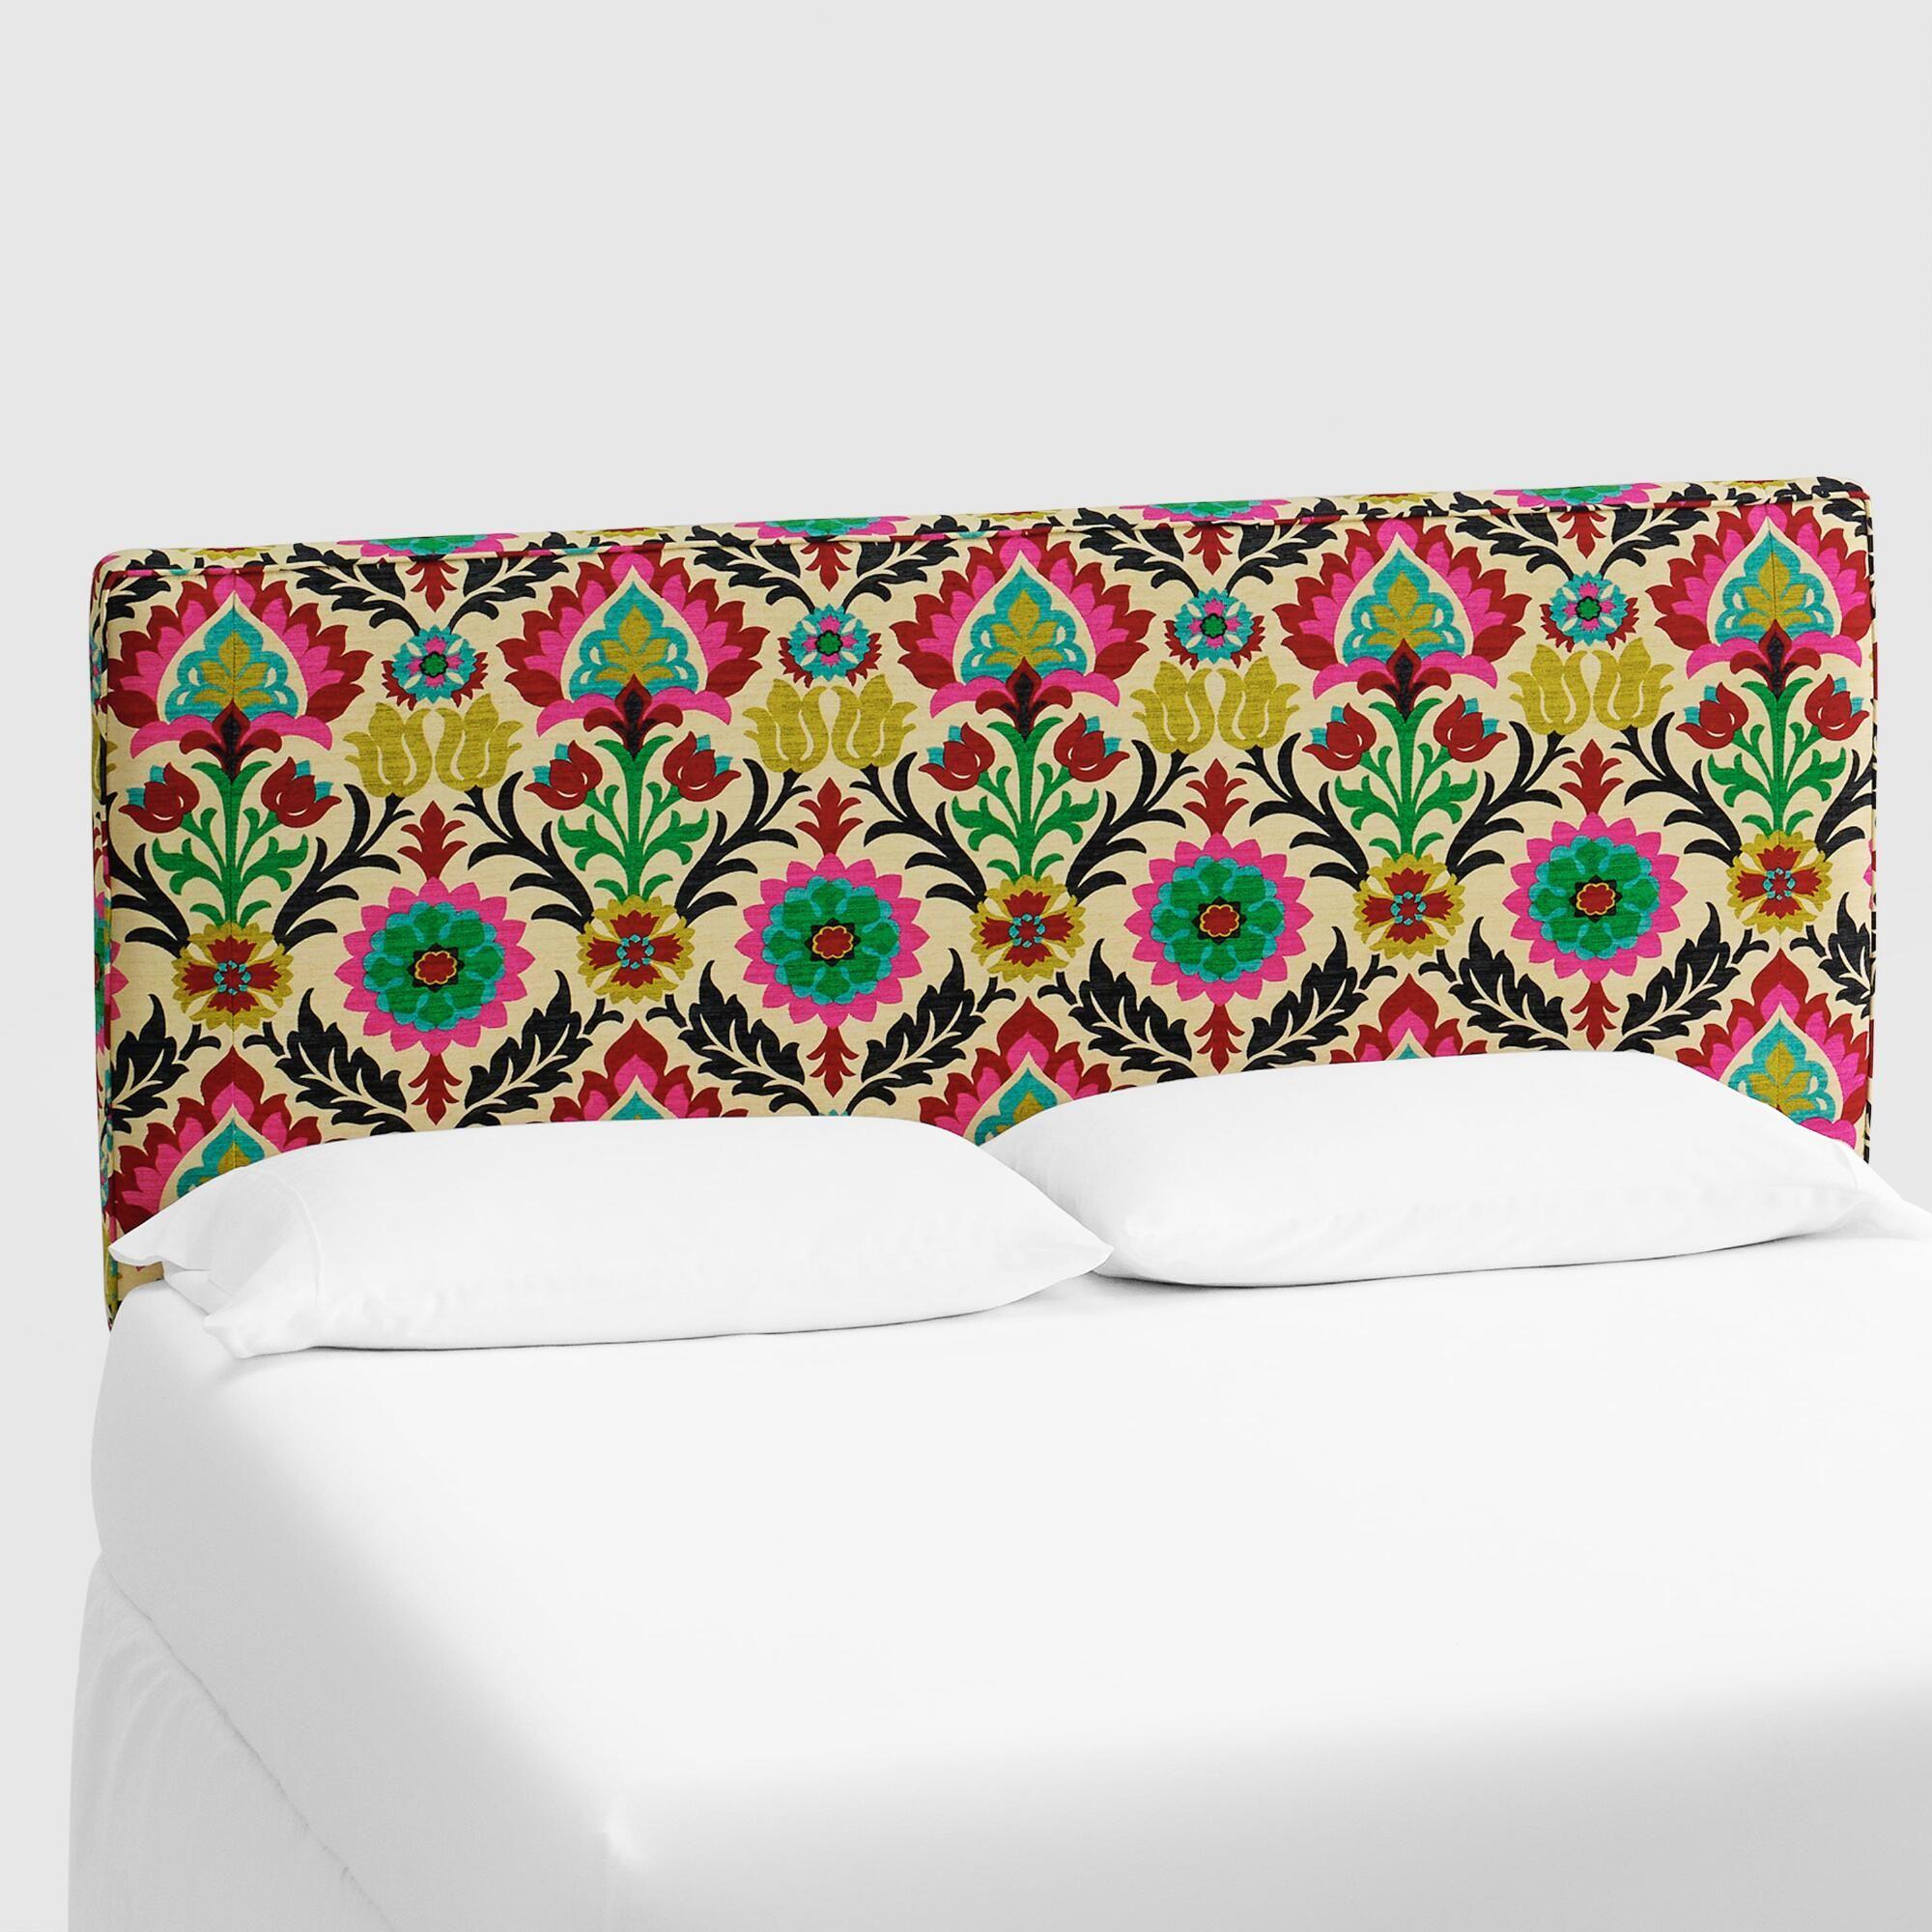 Desert Santa Maria Loran Upholstered Headboard Multi  Fabric